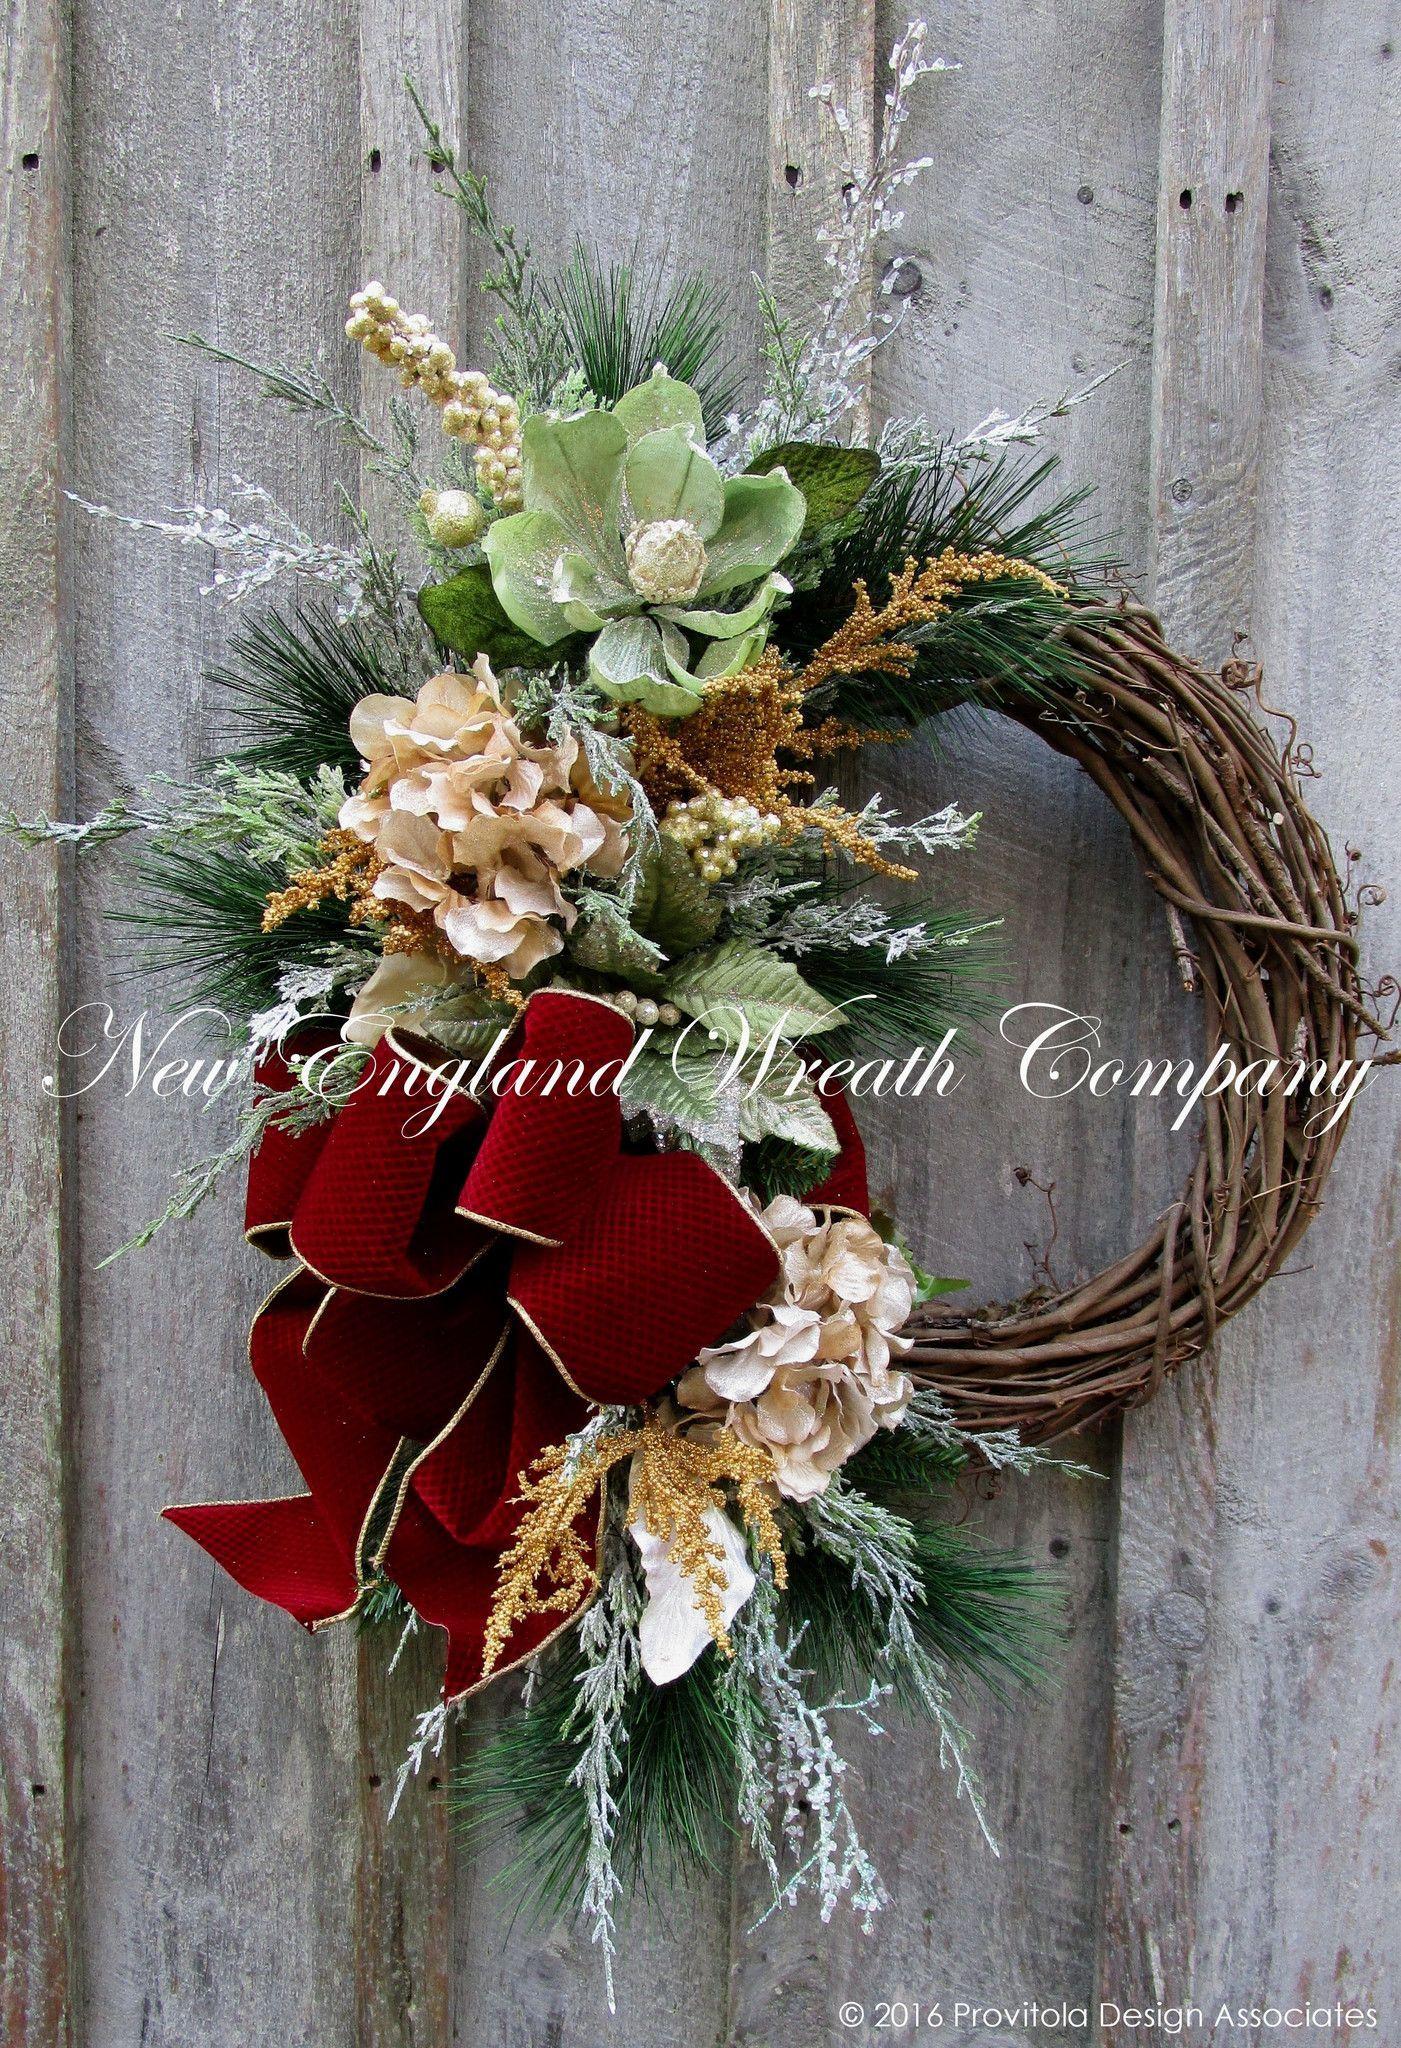 Copley Place Holiday Wreath Christmas Wreaths Christmas Wreaths Diy Holiday Wreaths